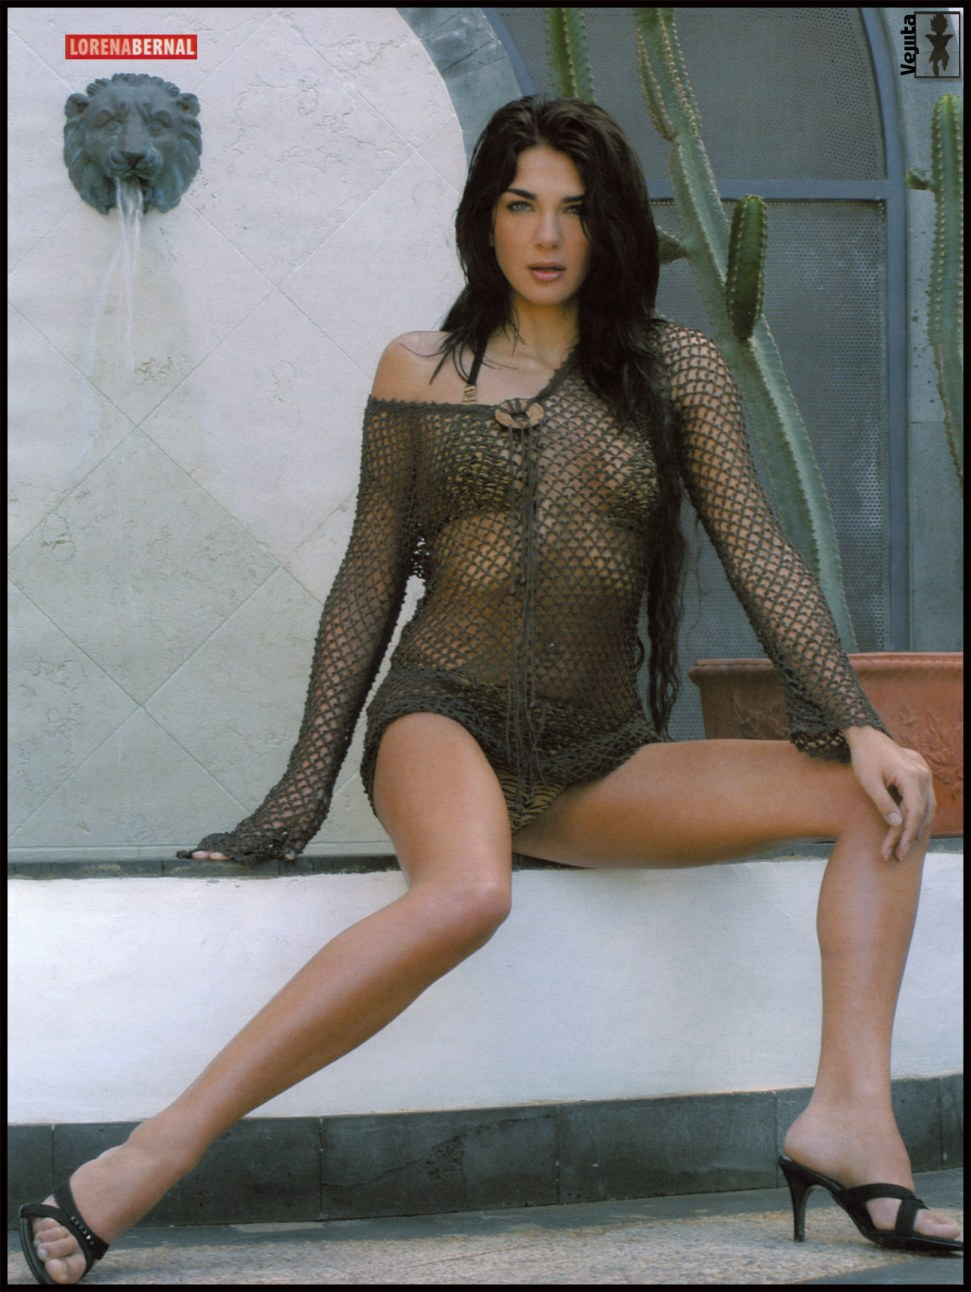 World Of Sports Mikel Arteta S Wife Lorena Bernal Part3